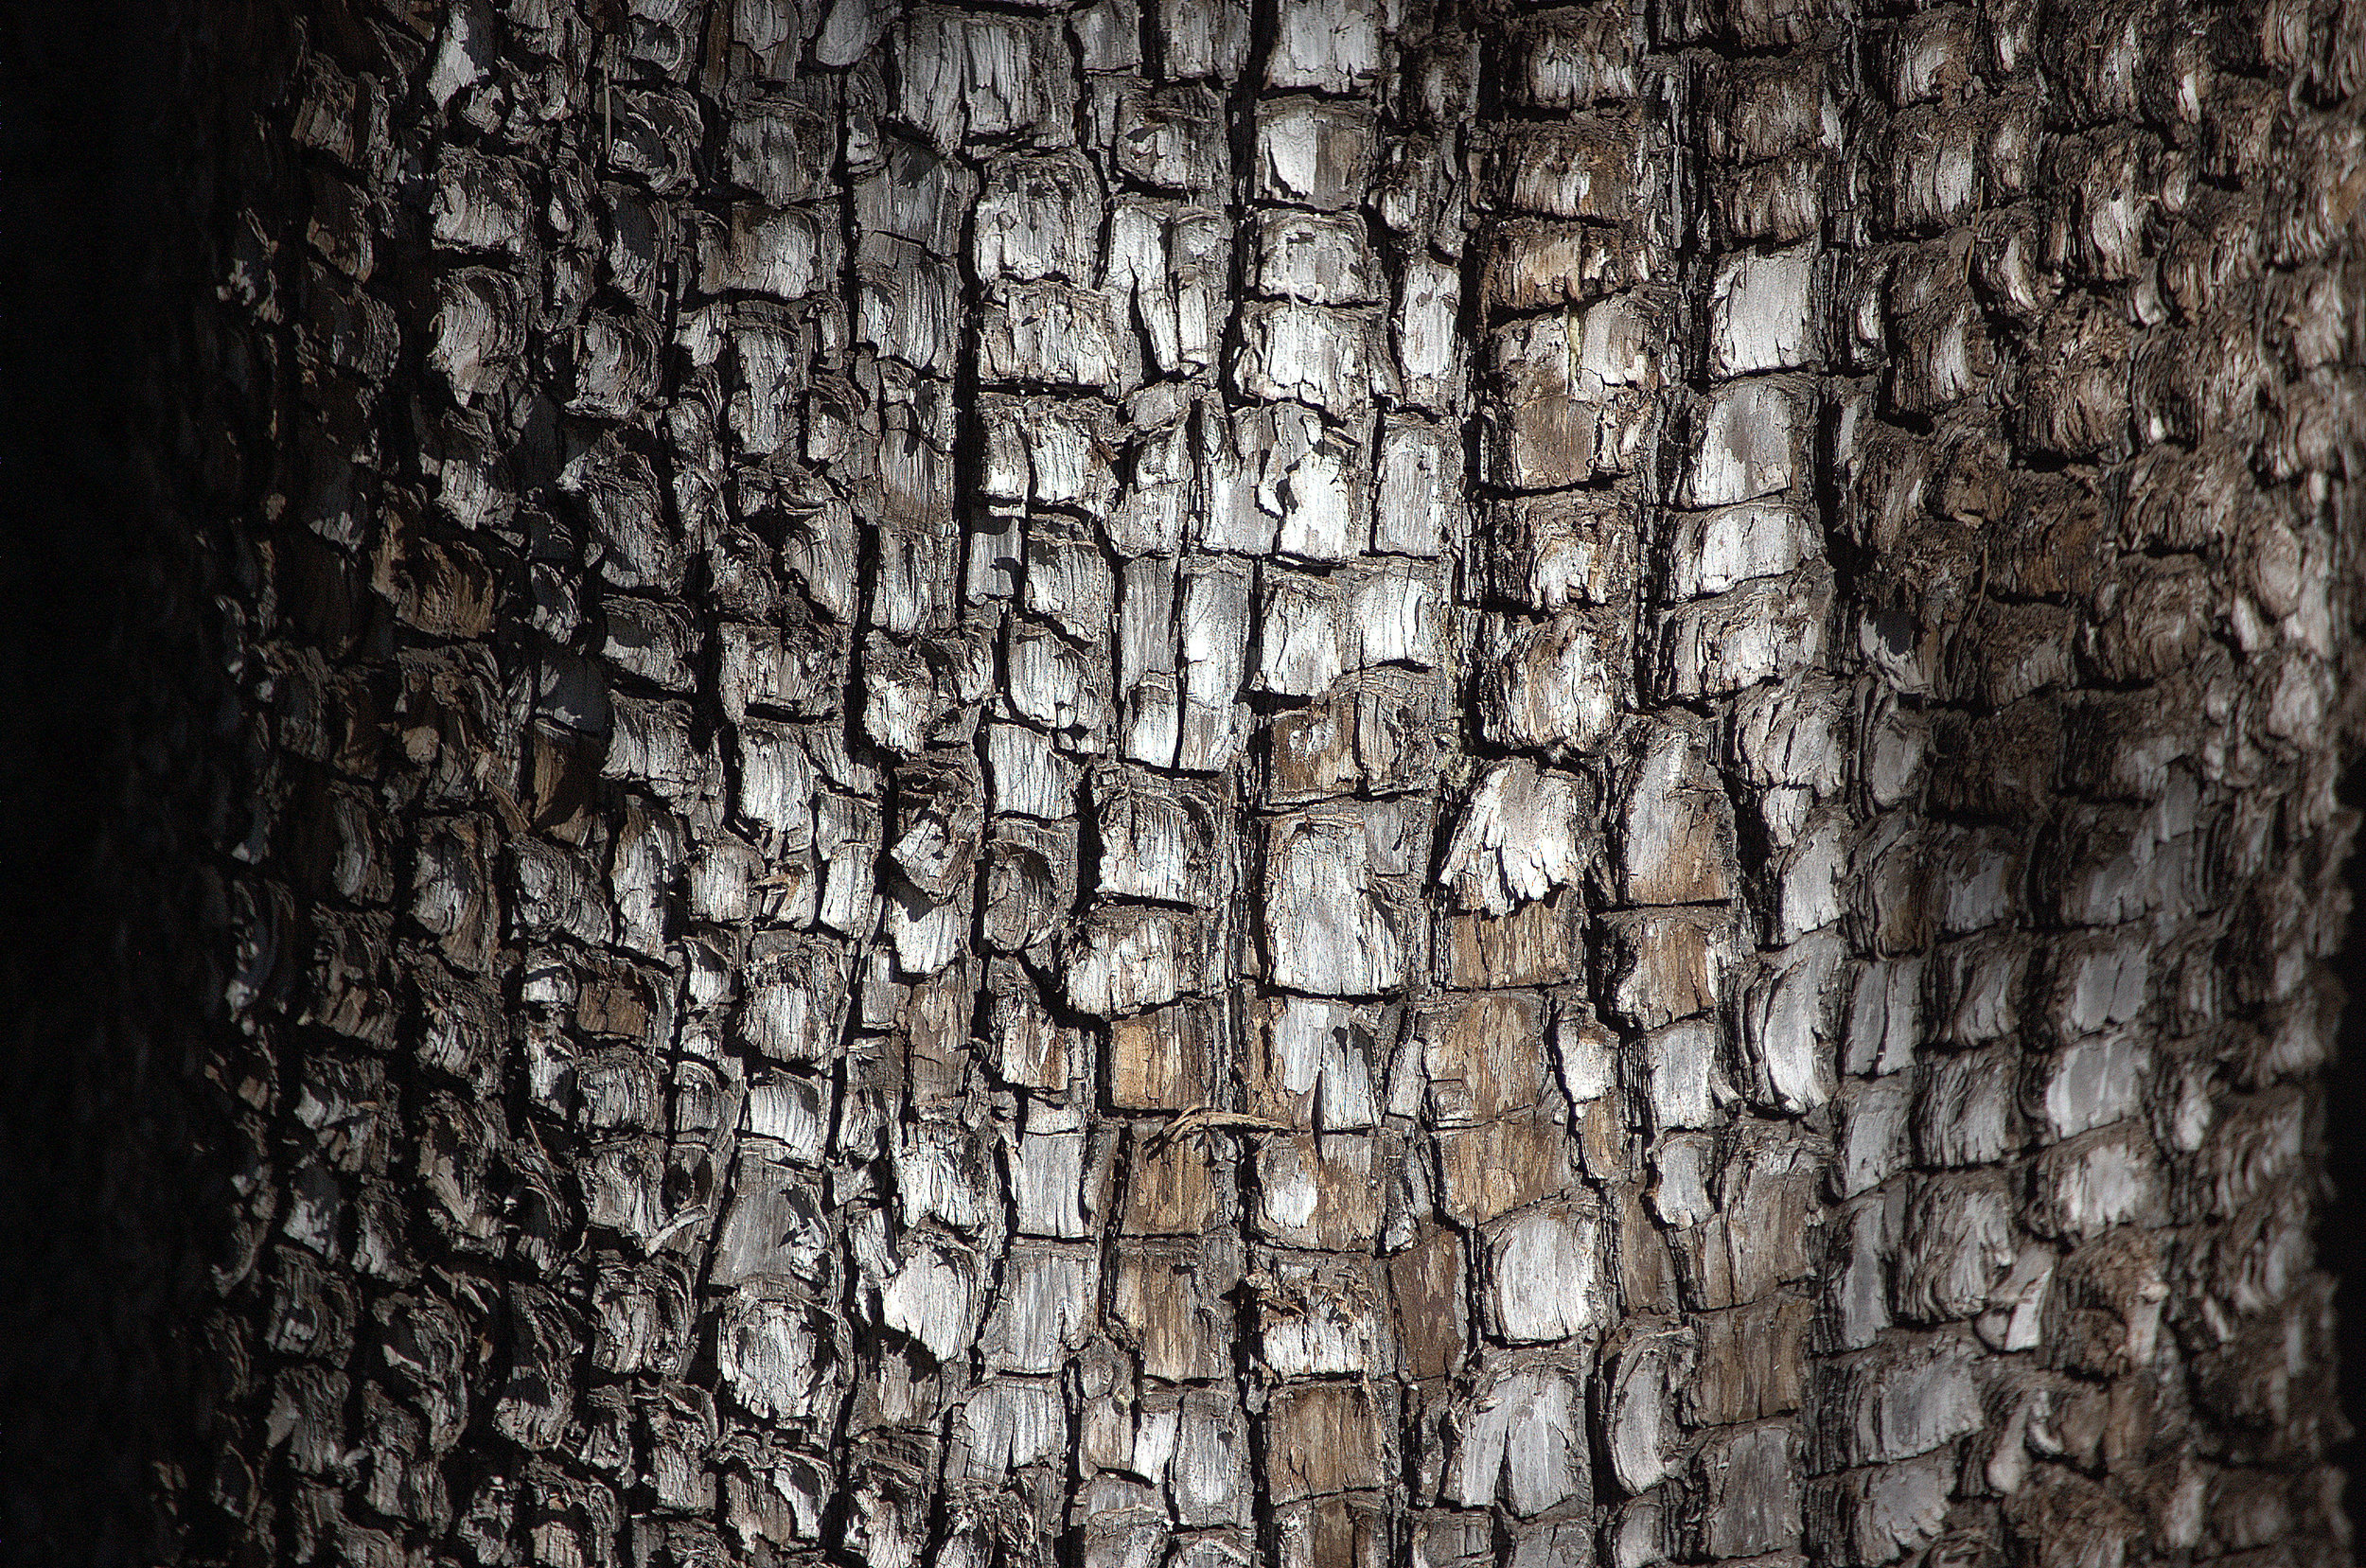 Juniperus deppeana, Alligator Juniper